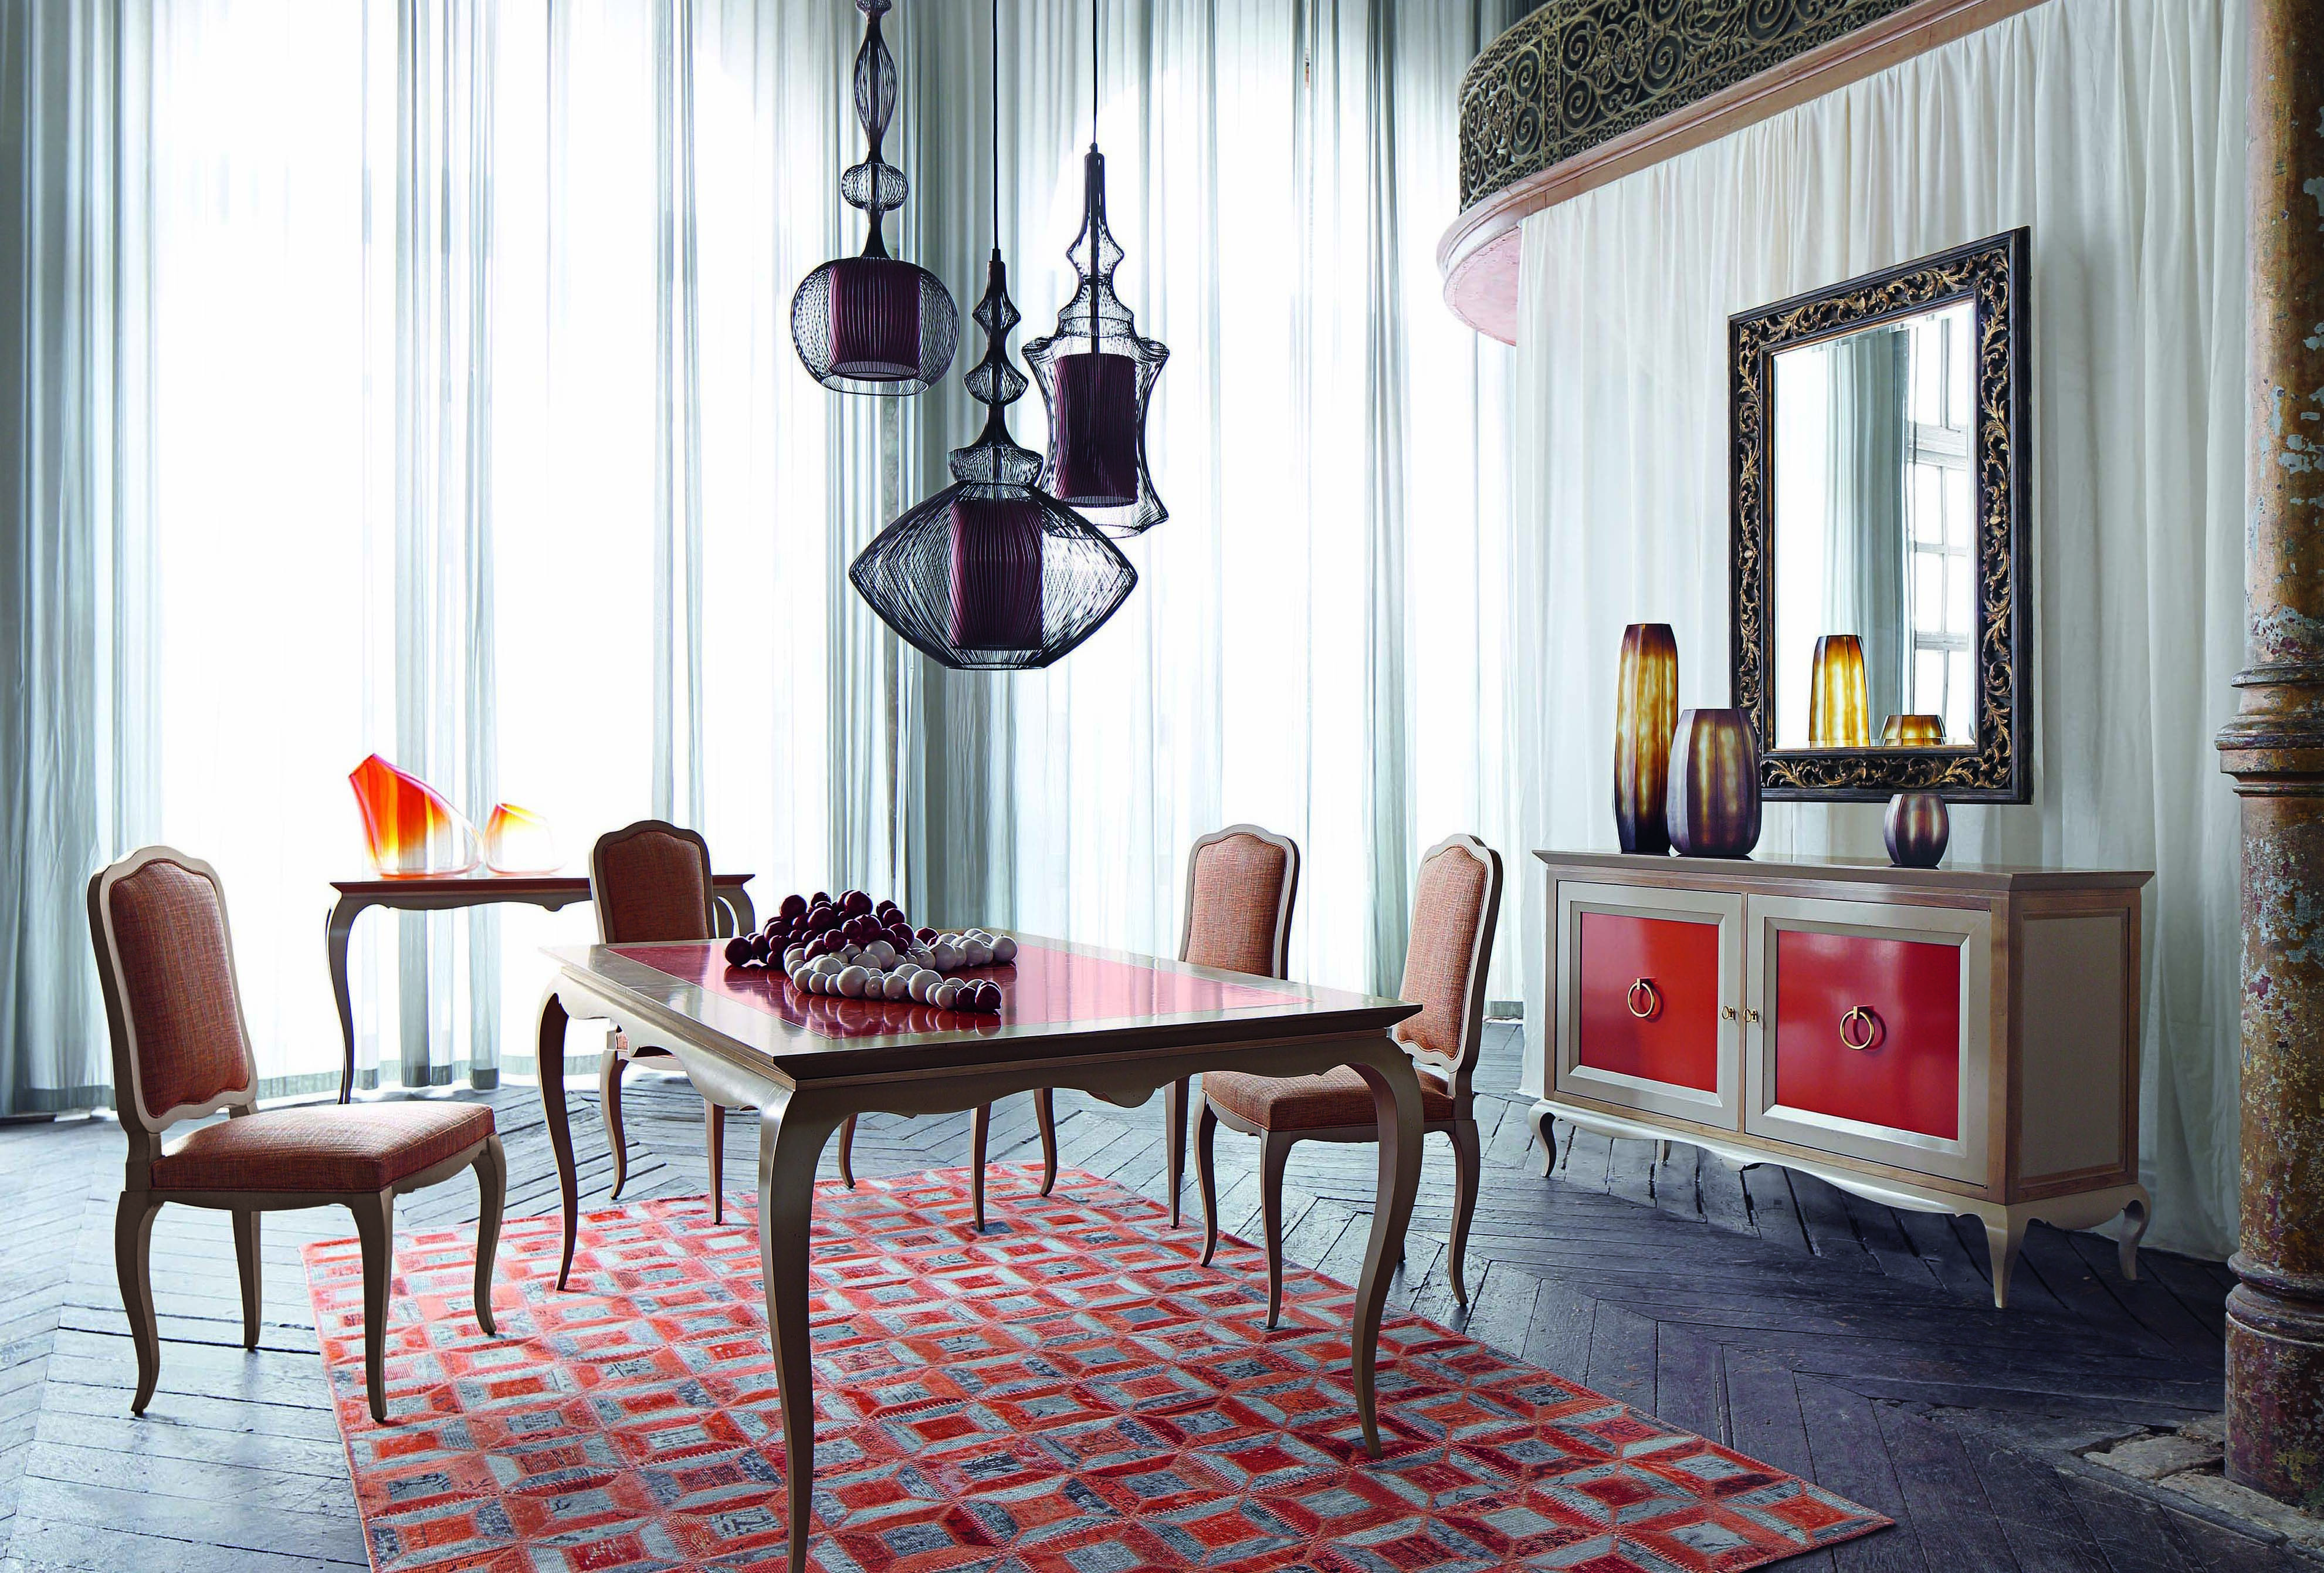 Roche Bobois Bel Ami Dining Table Design Pierre Dubois